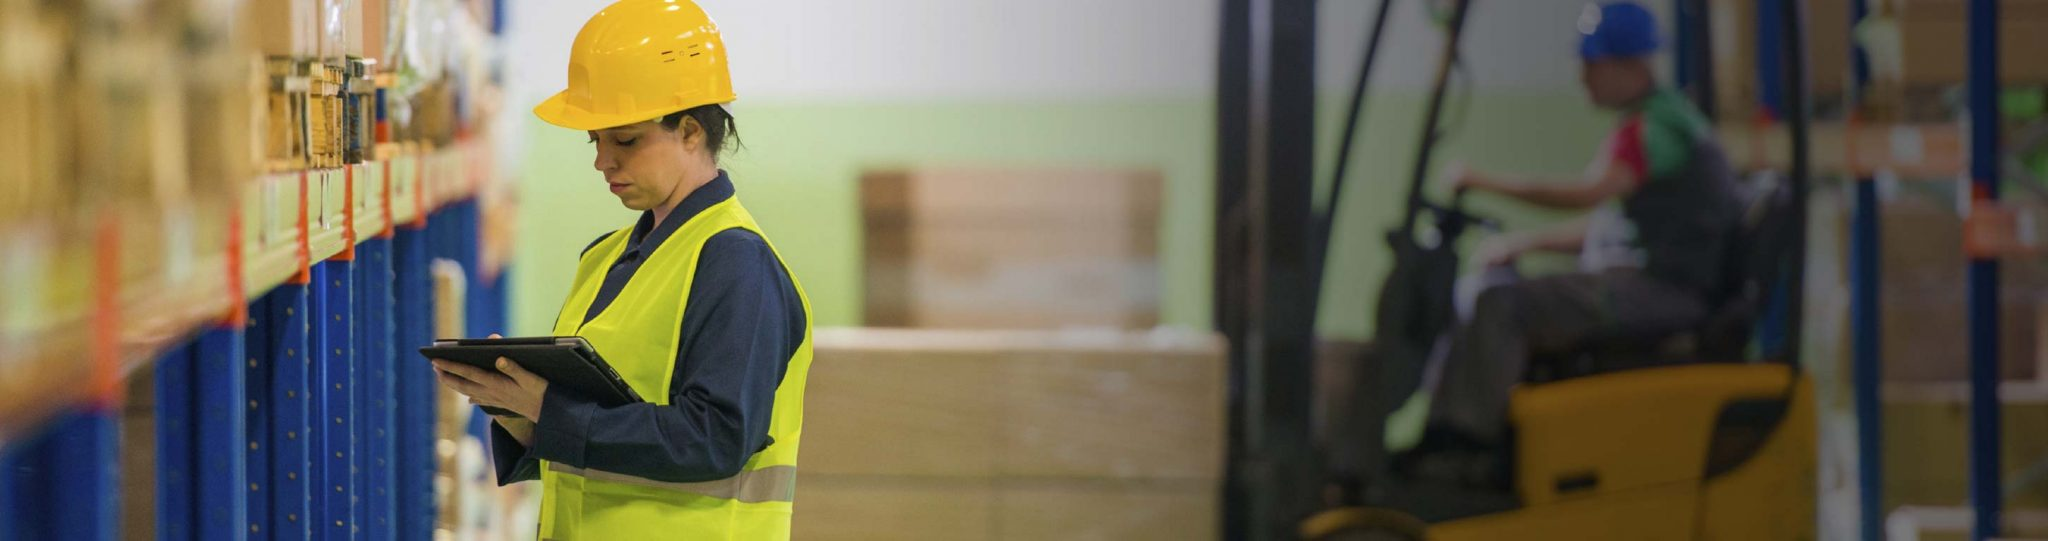 eLearning Employee Training